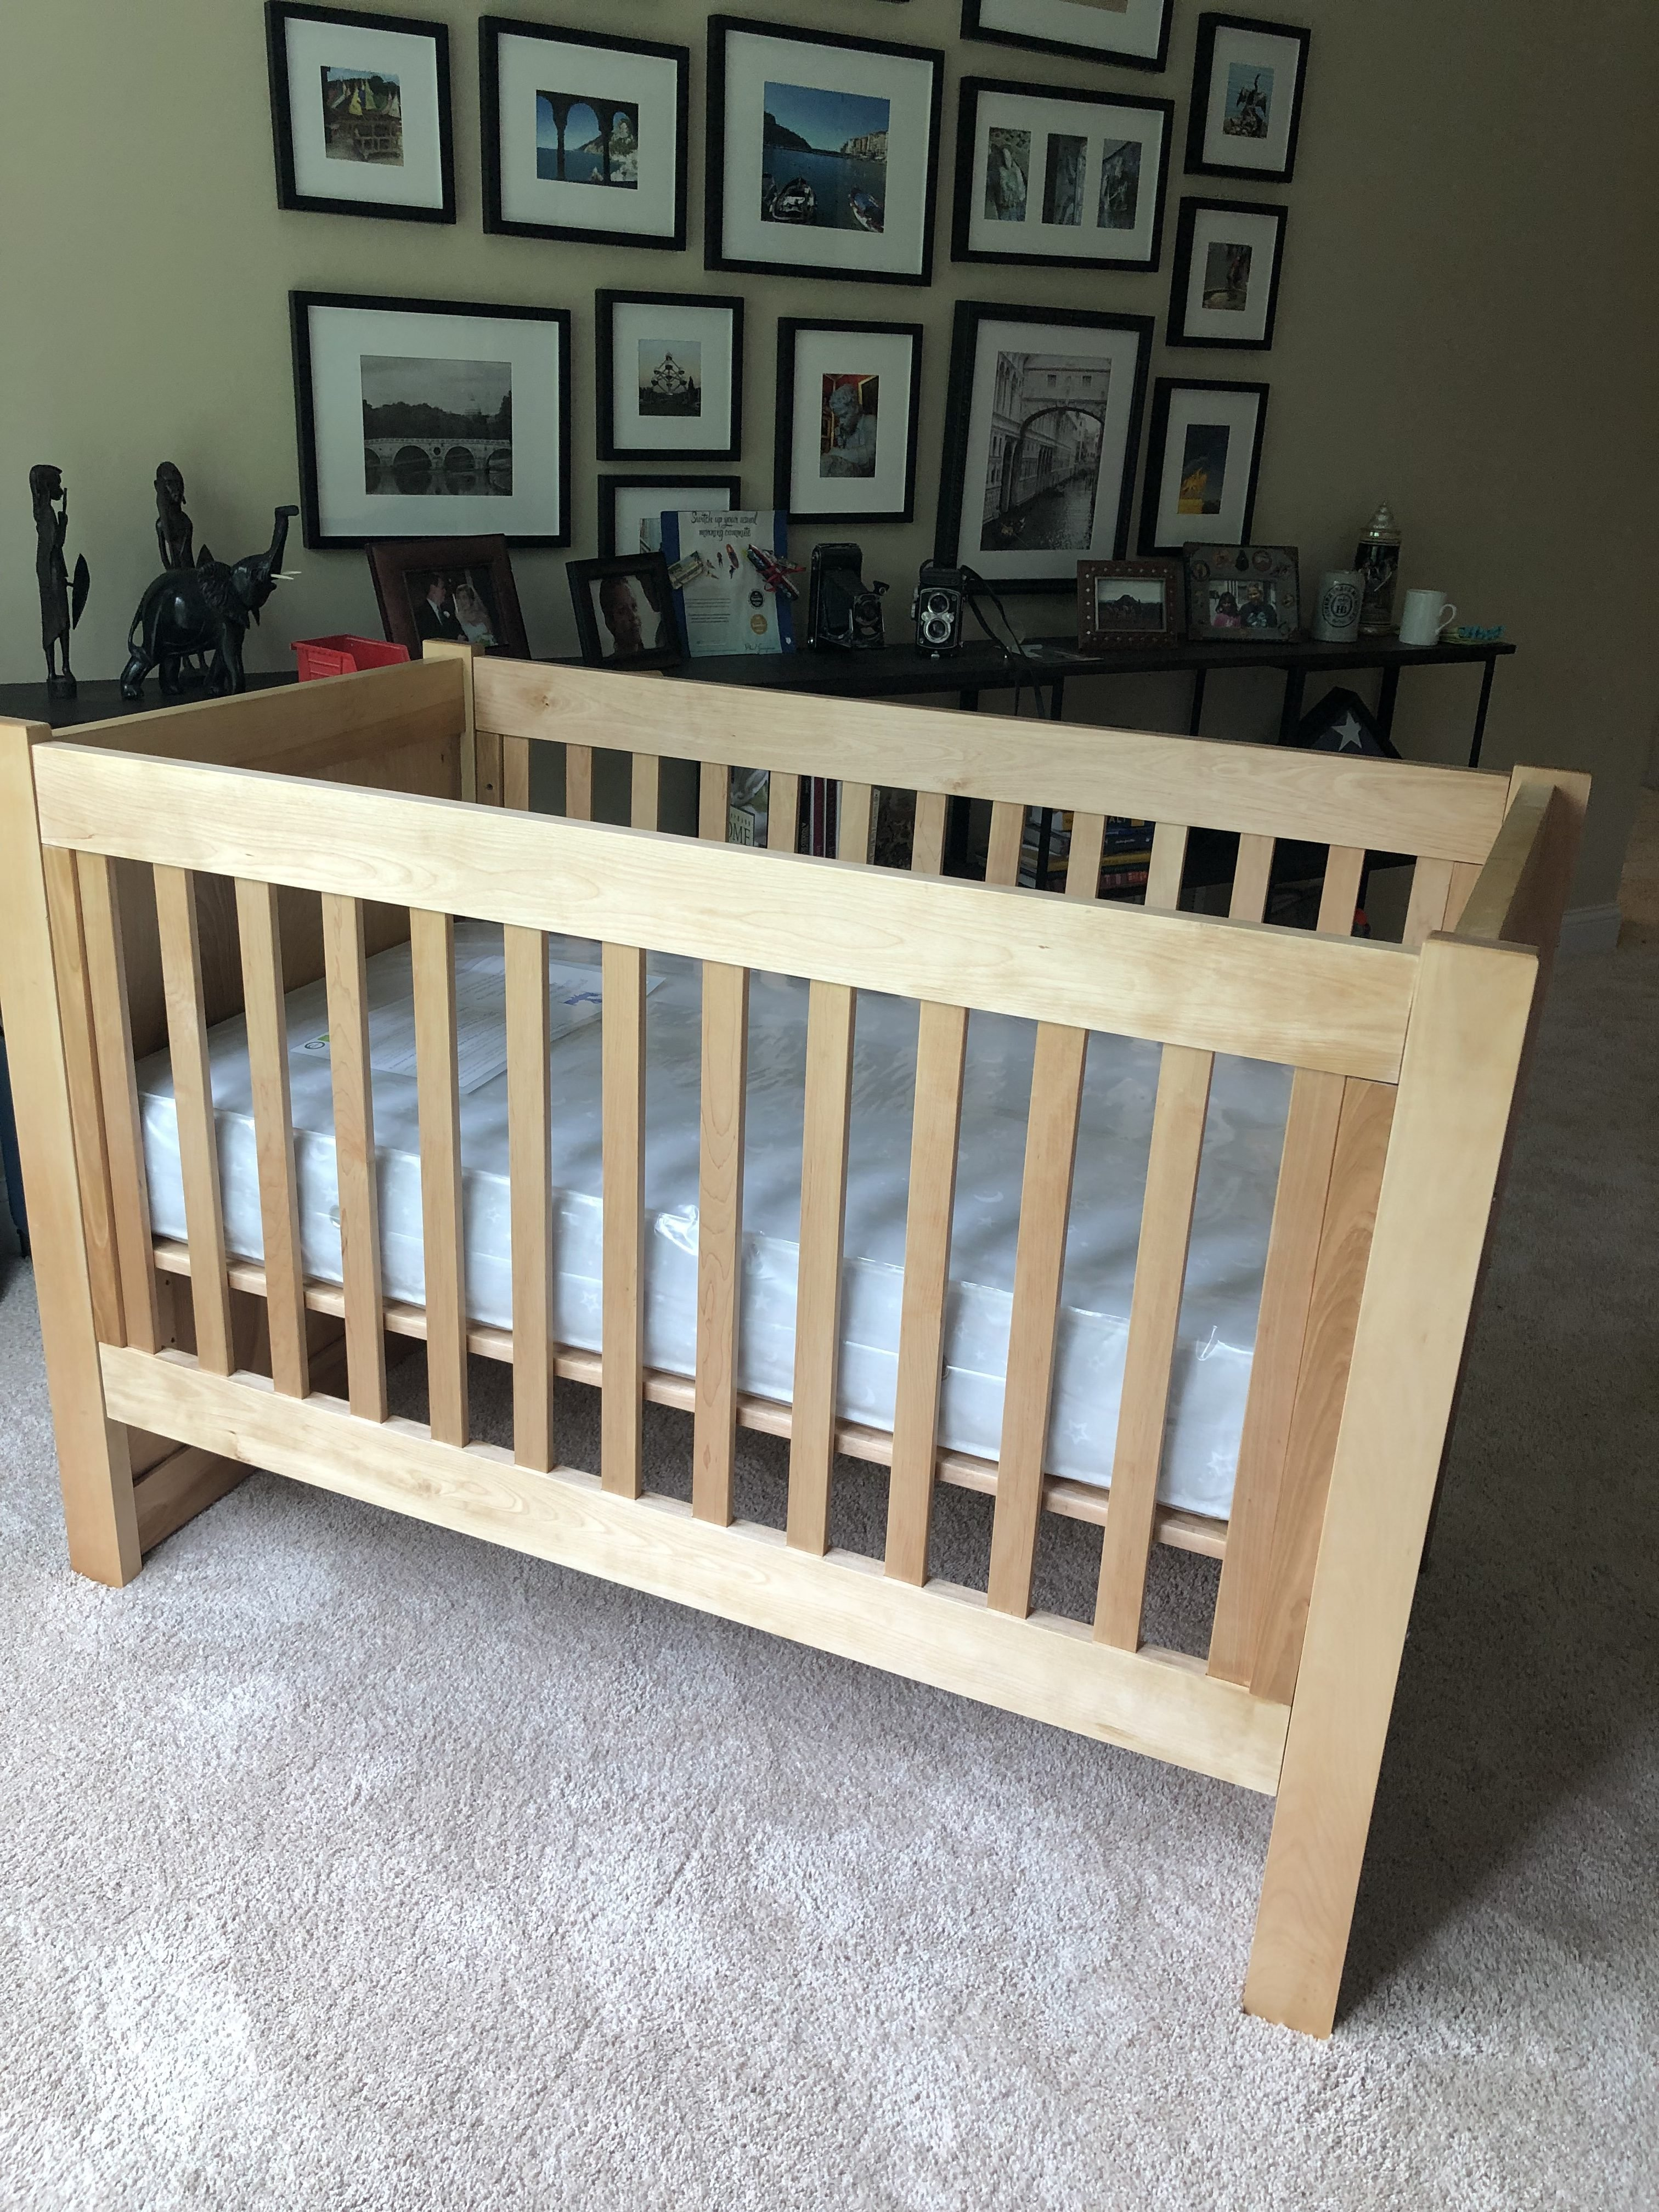 Baby's Cot/Crib by Curt Ruhlman